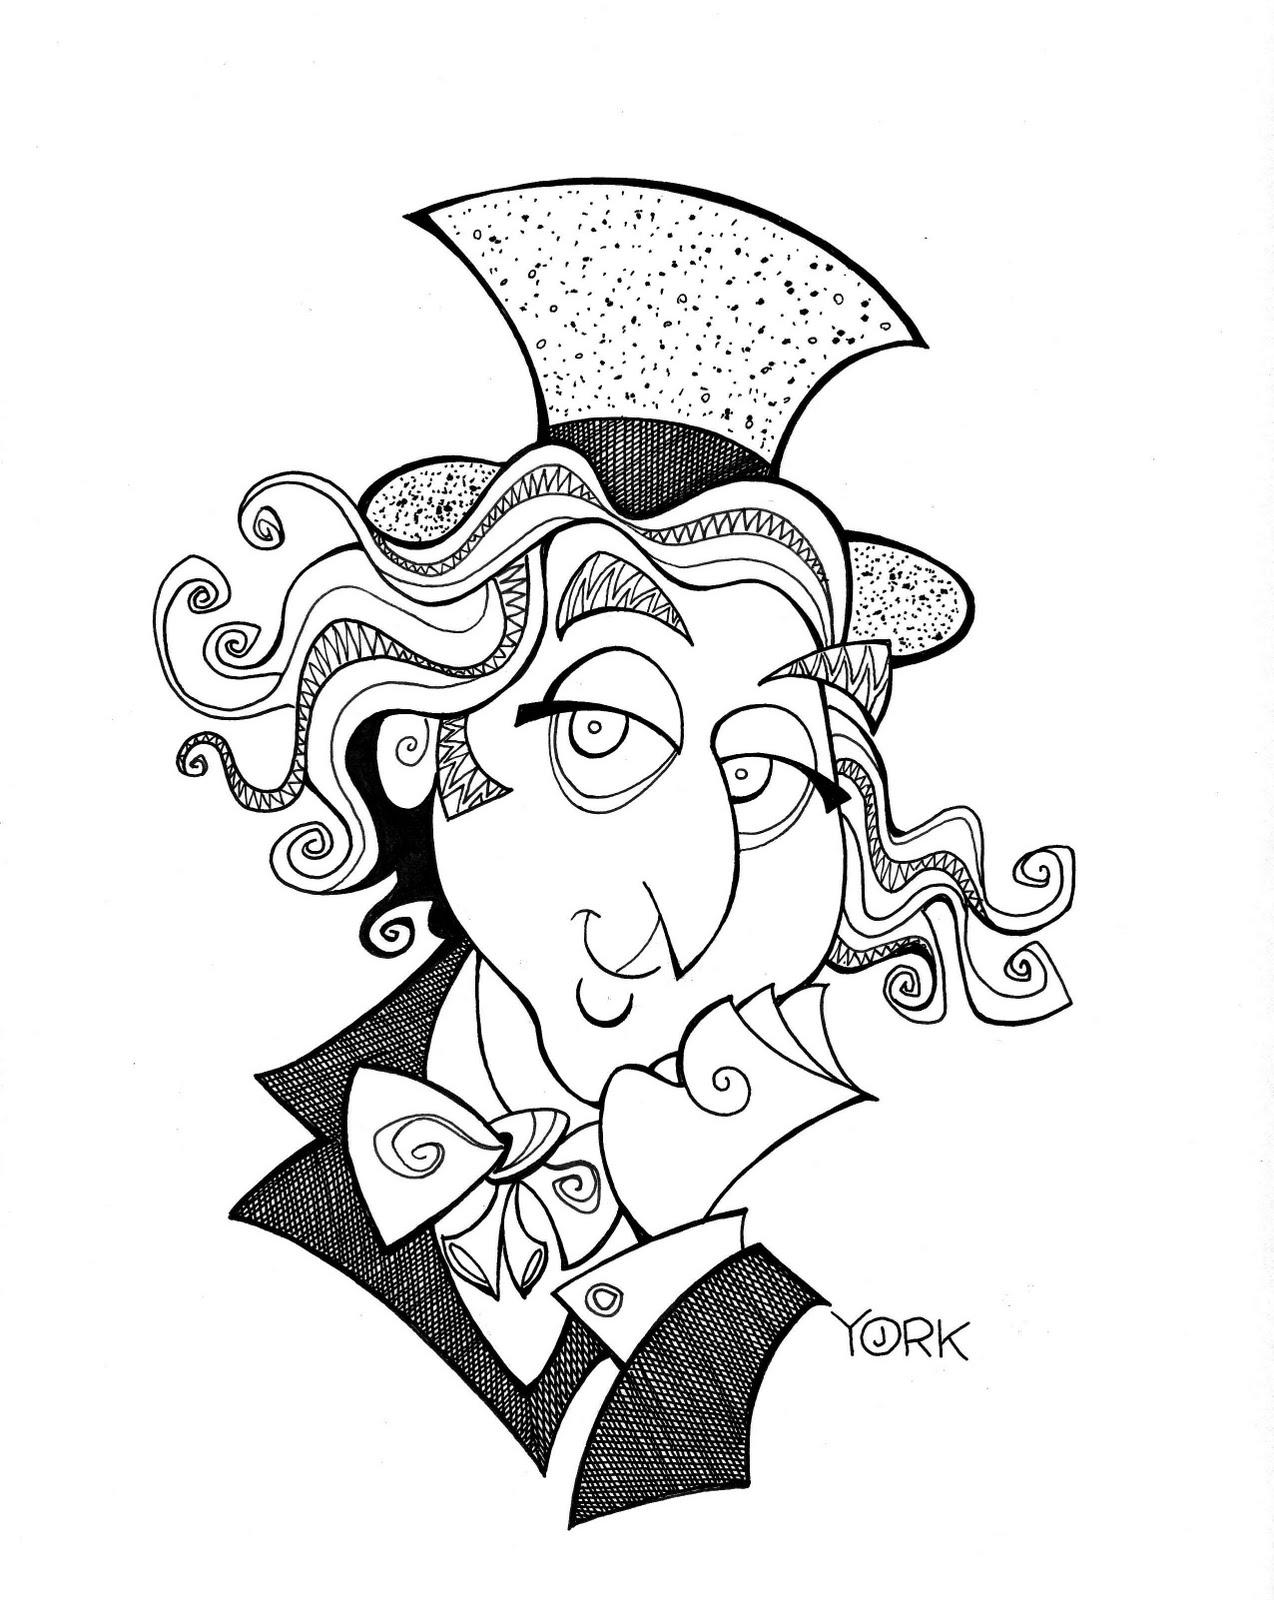 ... Willy Wonka Clip Art ...-... Willy Wonka Clip Art ...-4